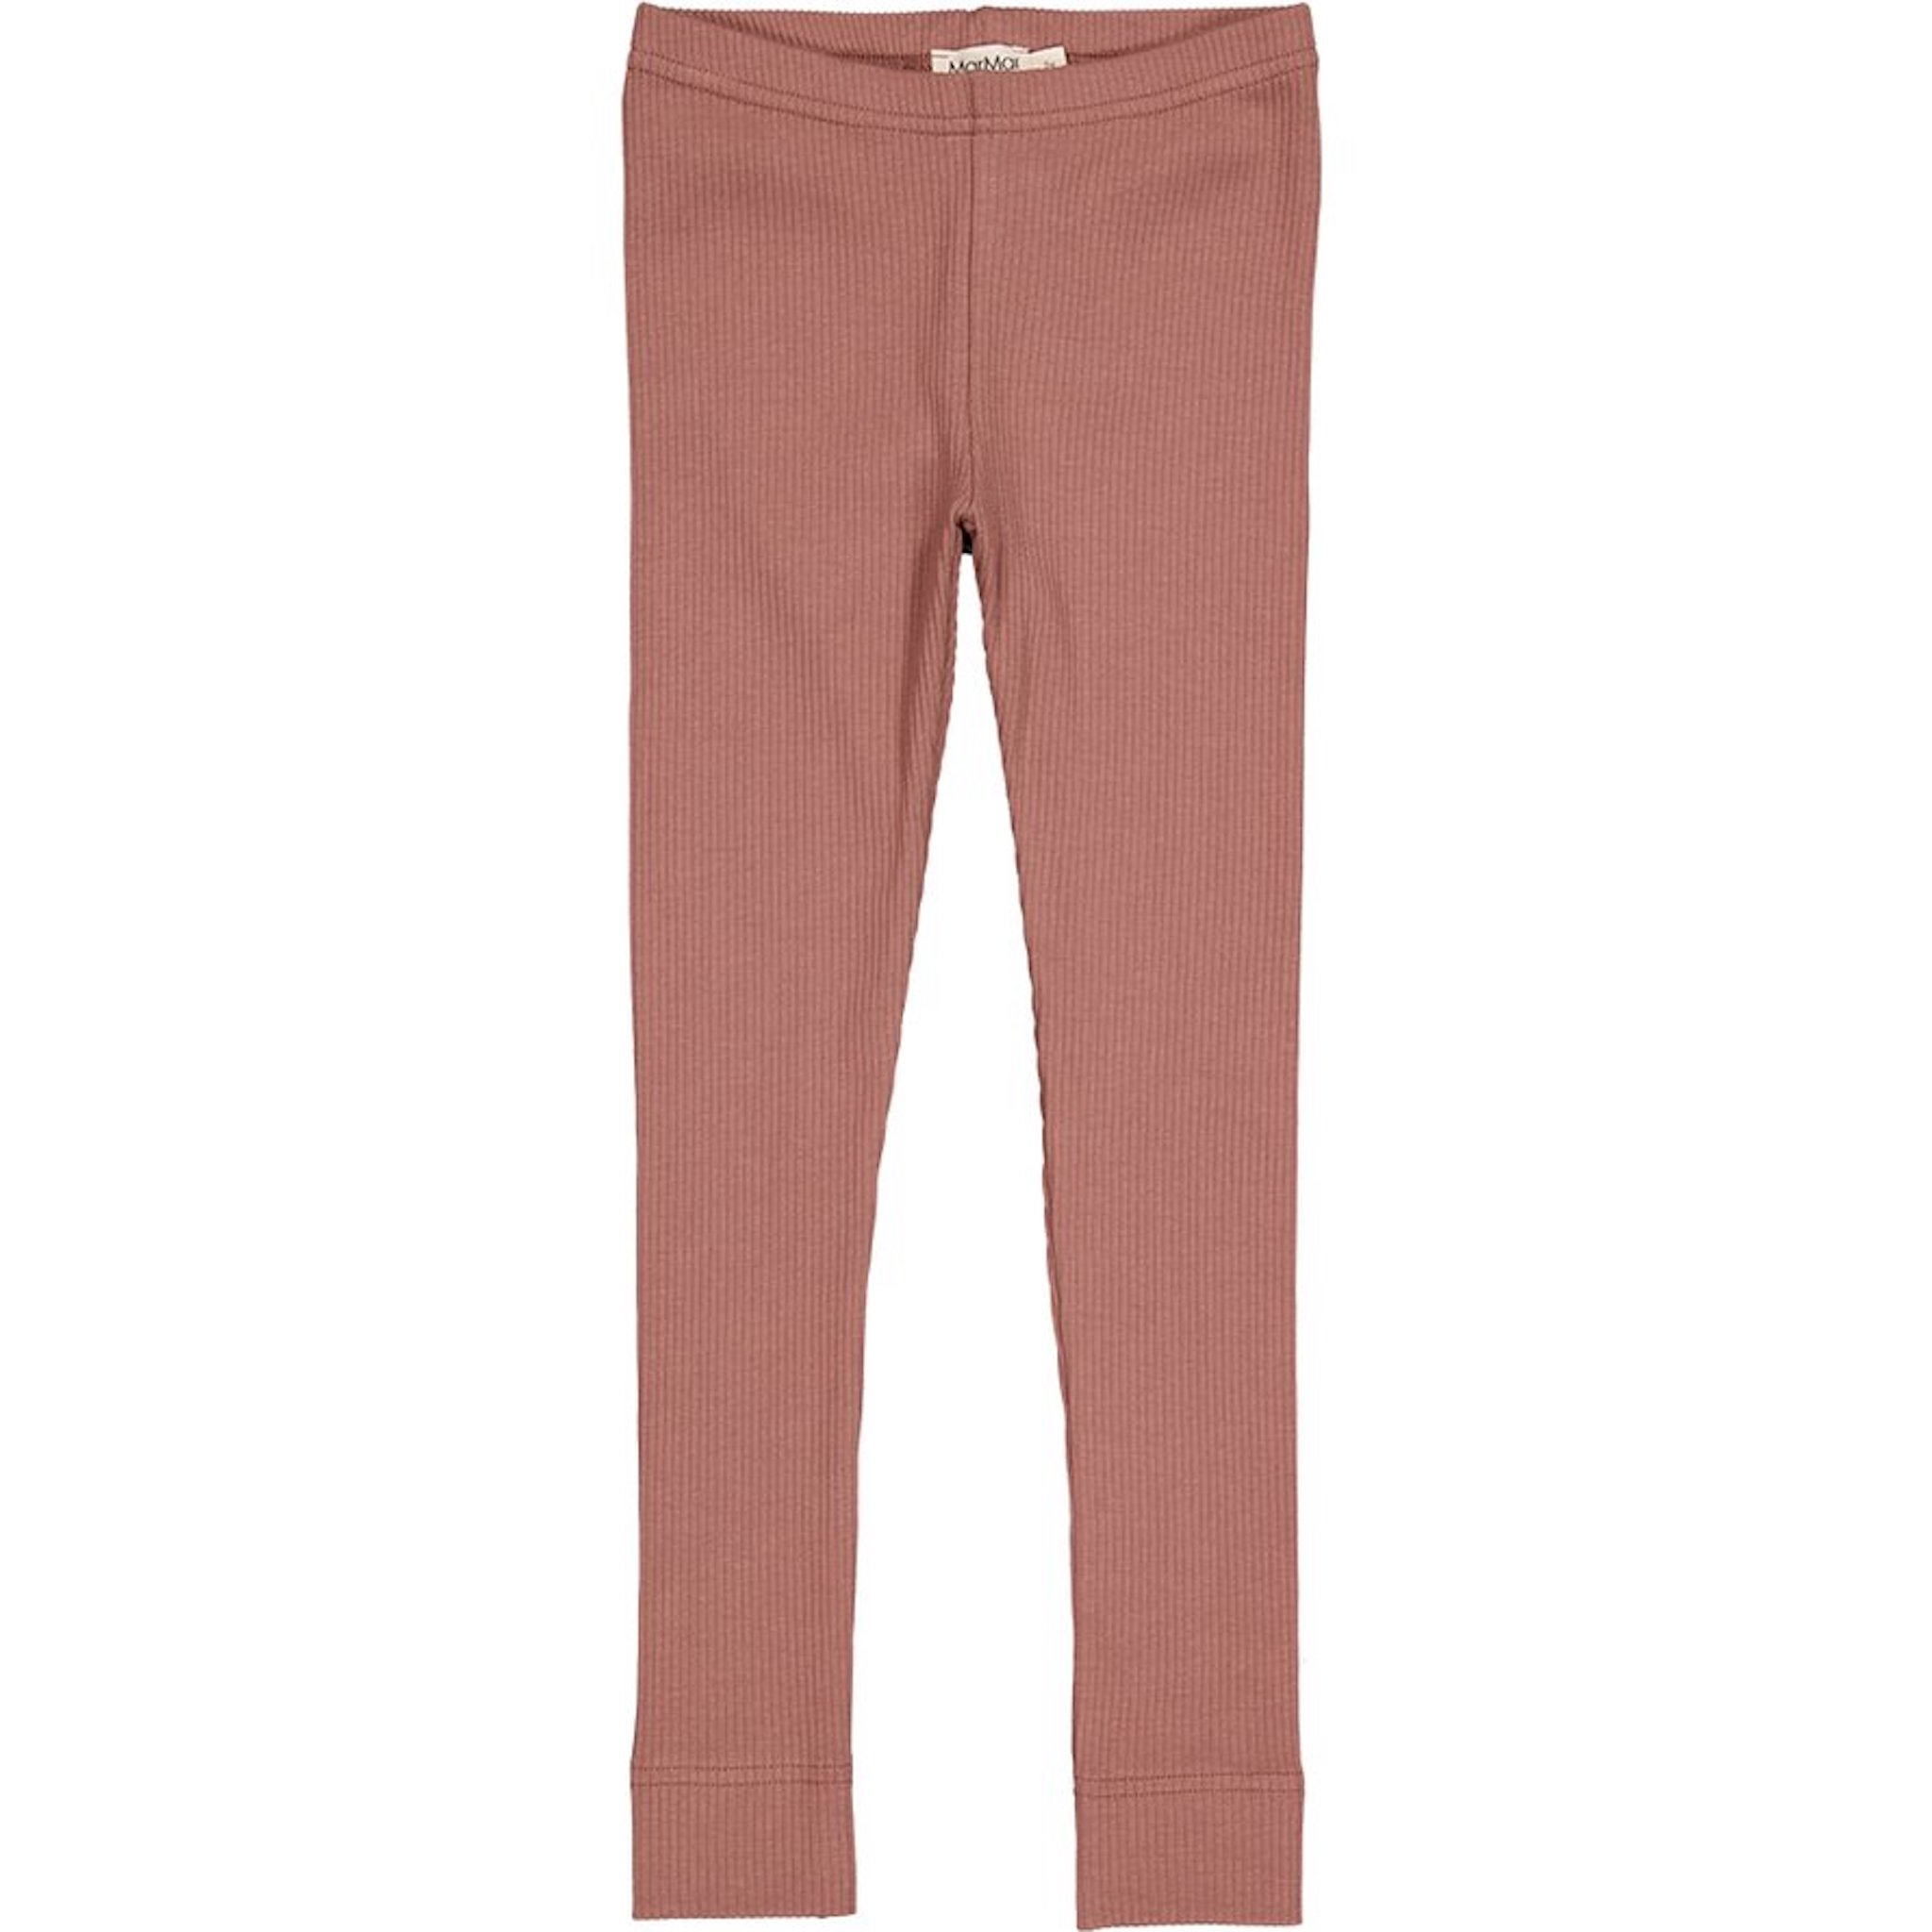 MarMar - Leg Leggings - madeira rose